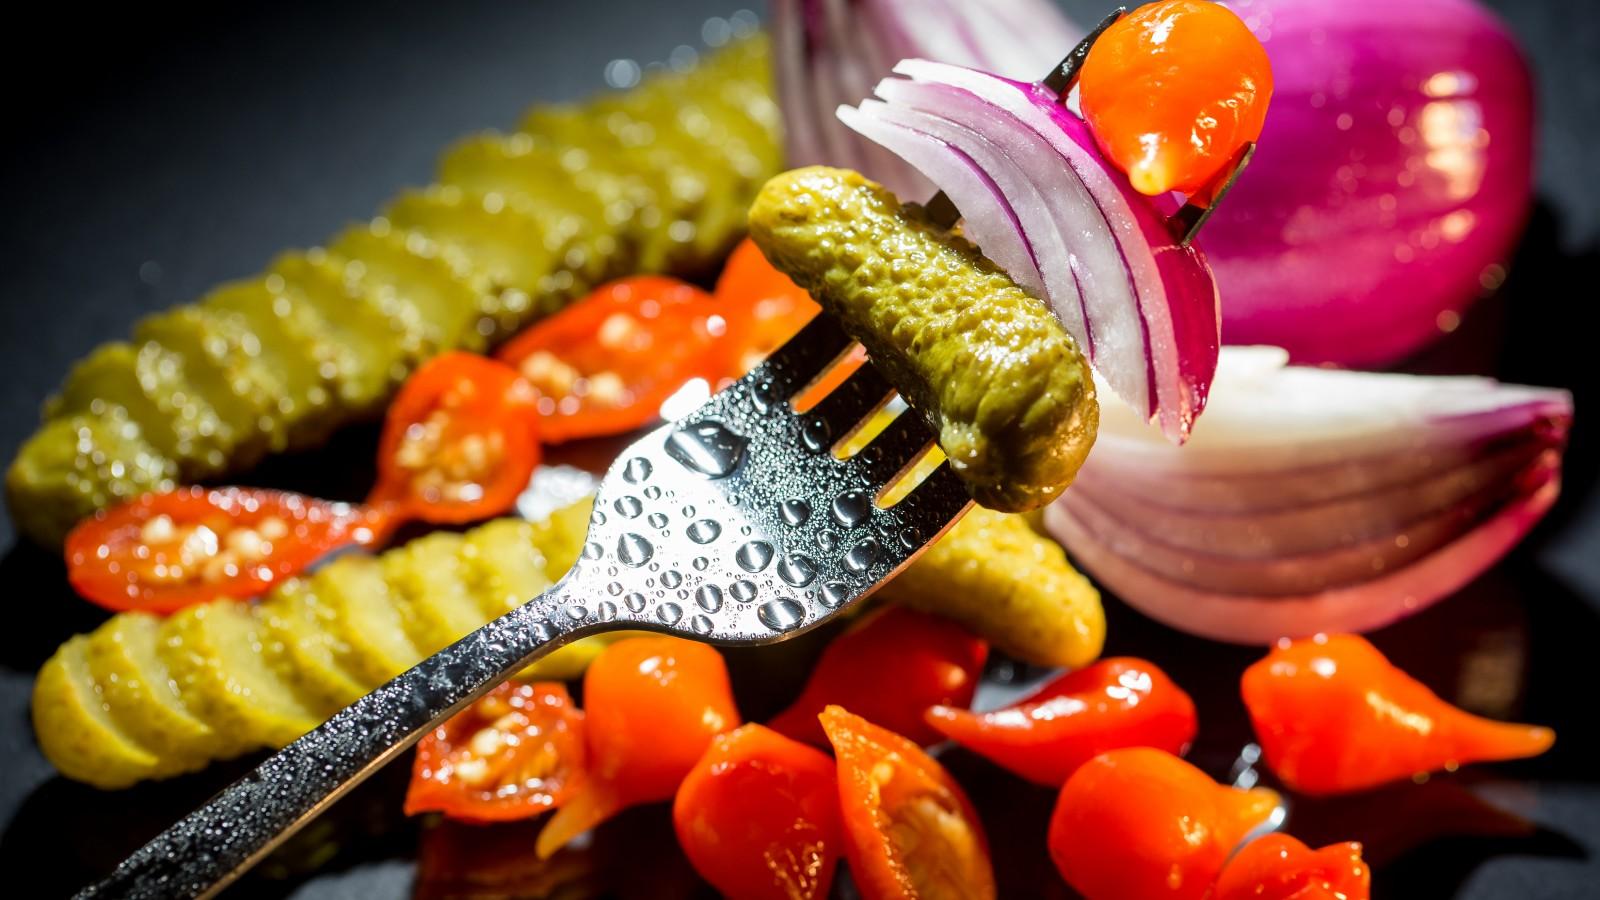 marinovannye-ogurcy-pomidory